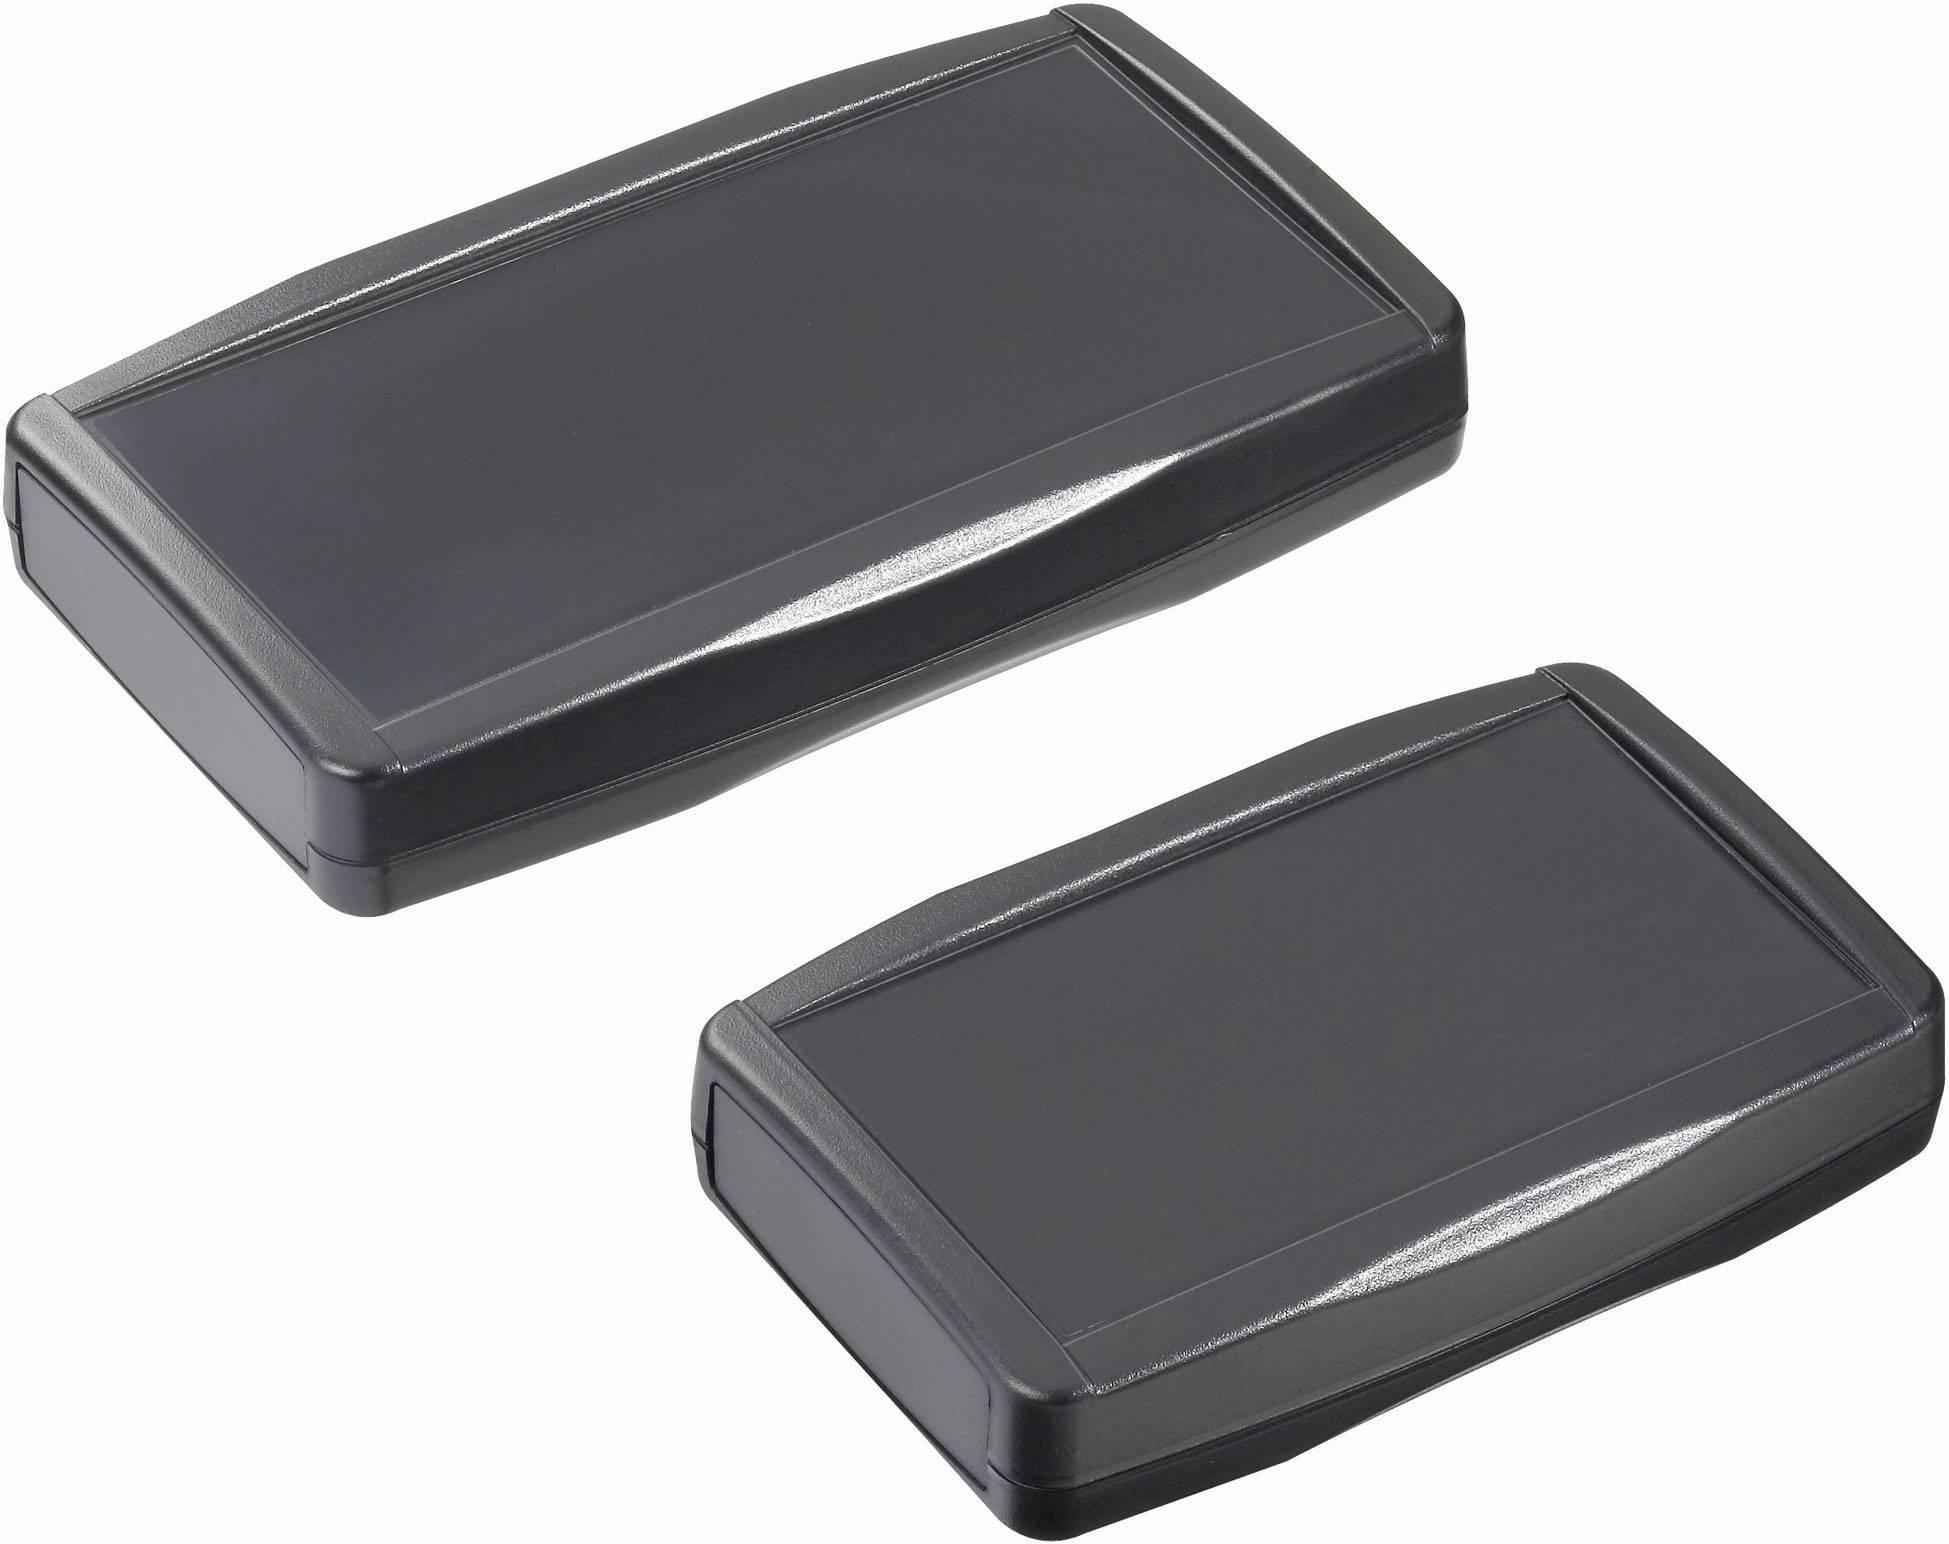 Plastová krabička Pactec XP-9VB, 29 x 140 x 91 mm, ABS, čierna, 1 ks